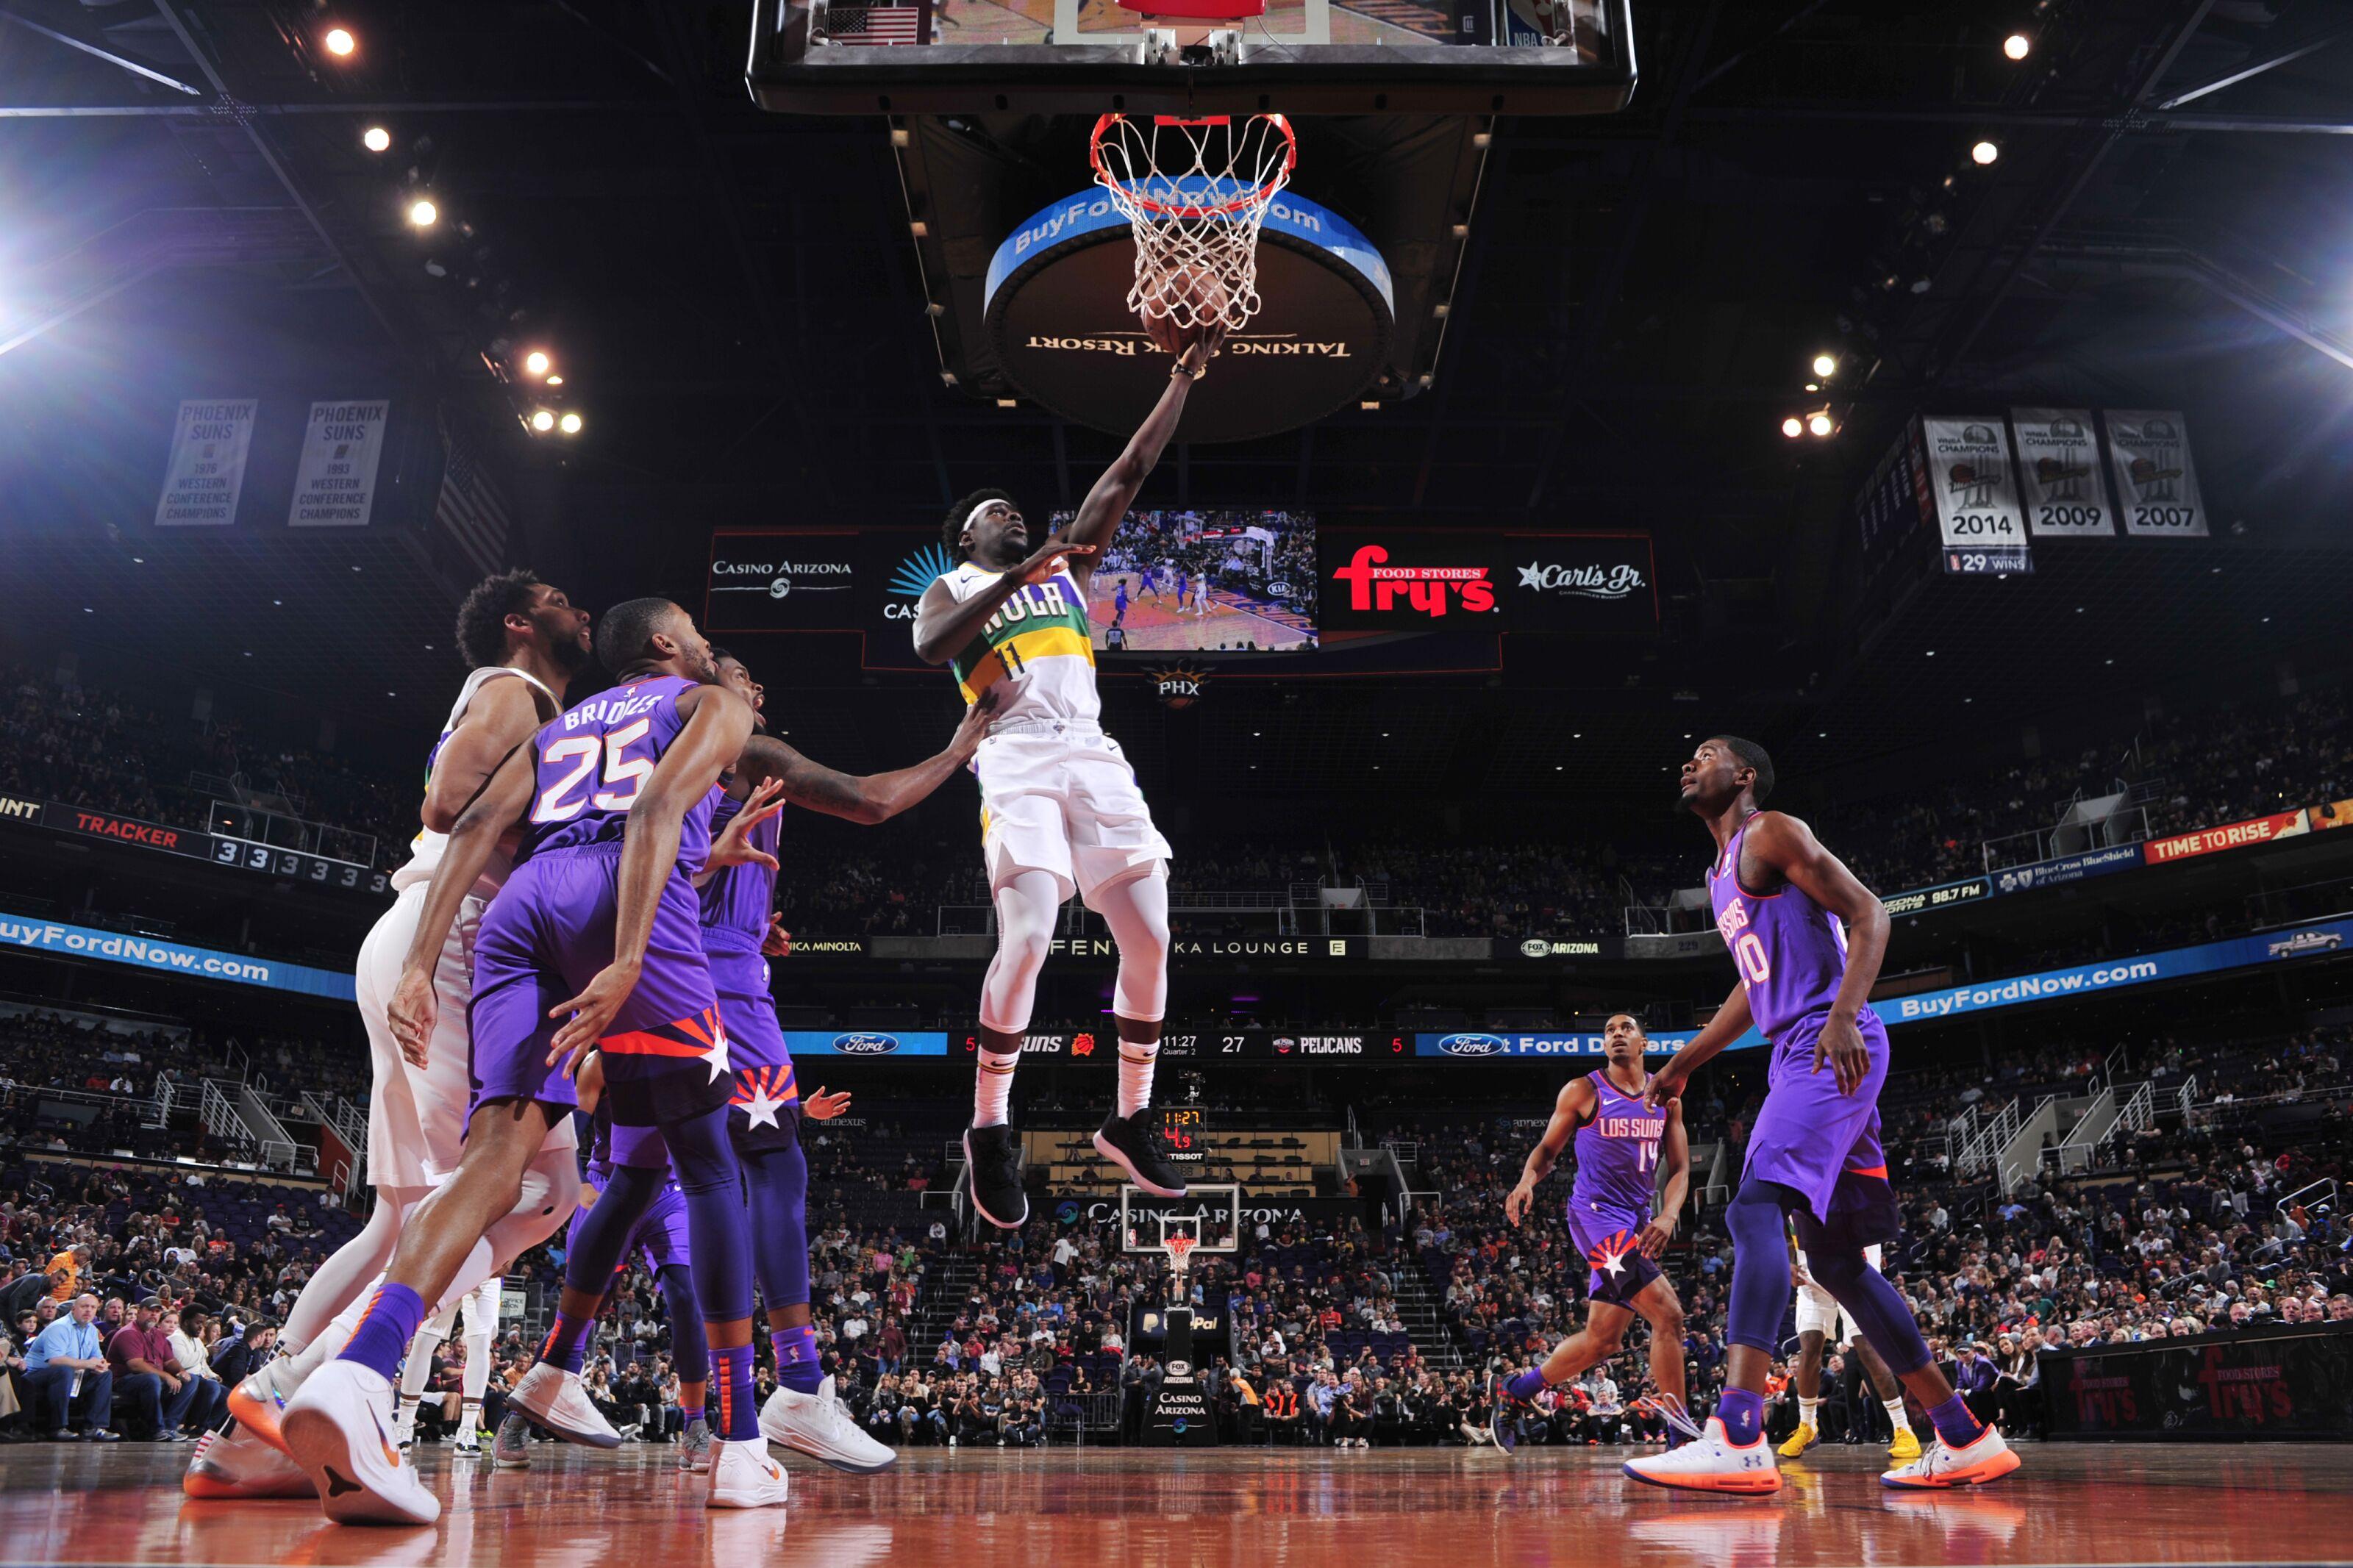 Should the Phoenix Suns celebrate a Holiday?